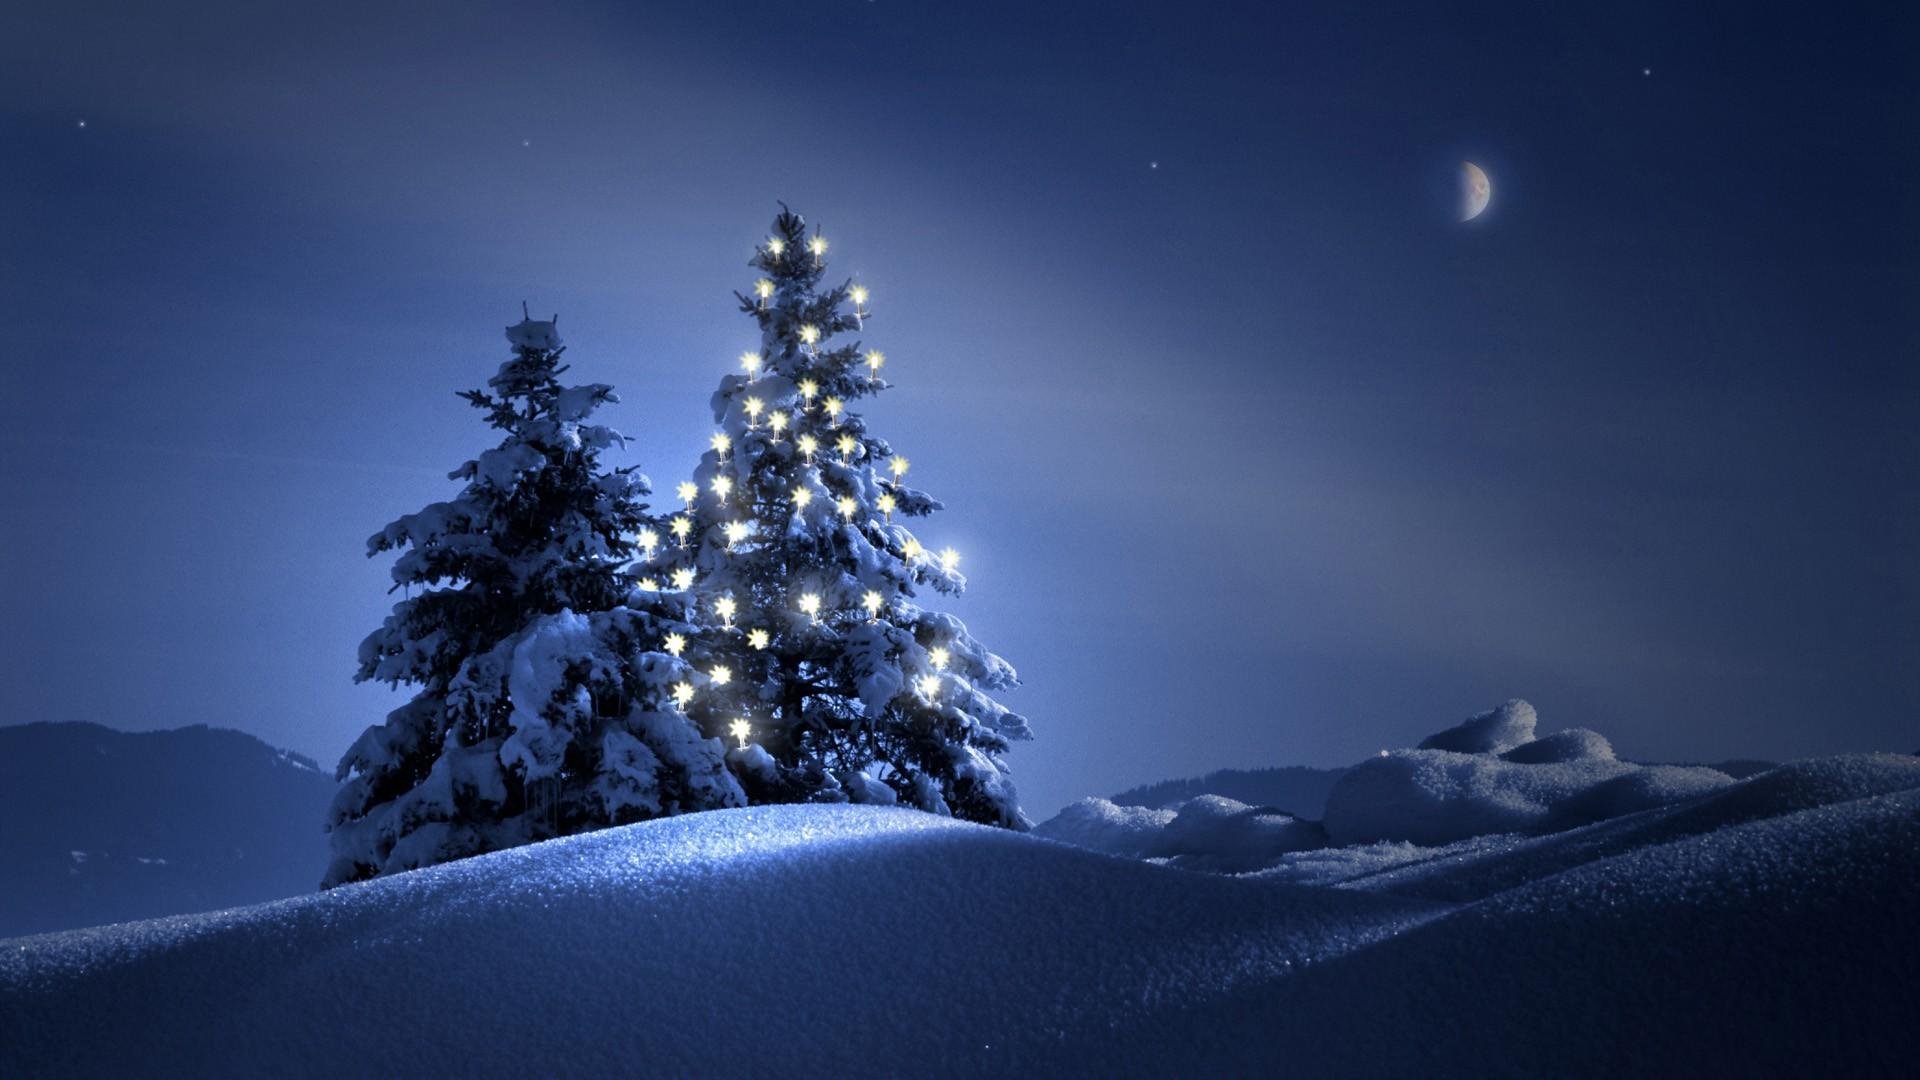 Christmas Tree On Snow Wallpaper Wide Wallpaper | WallpaperLepi